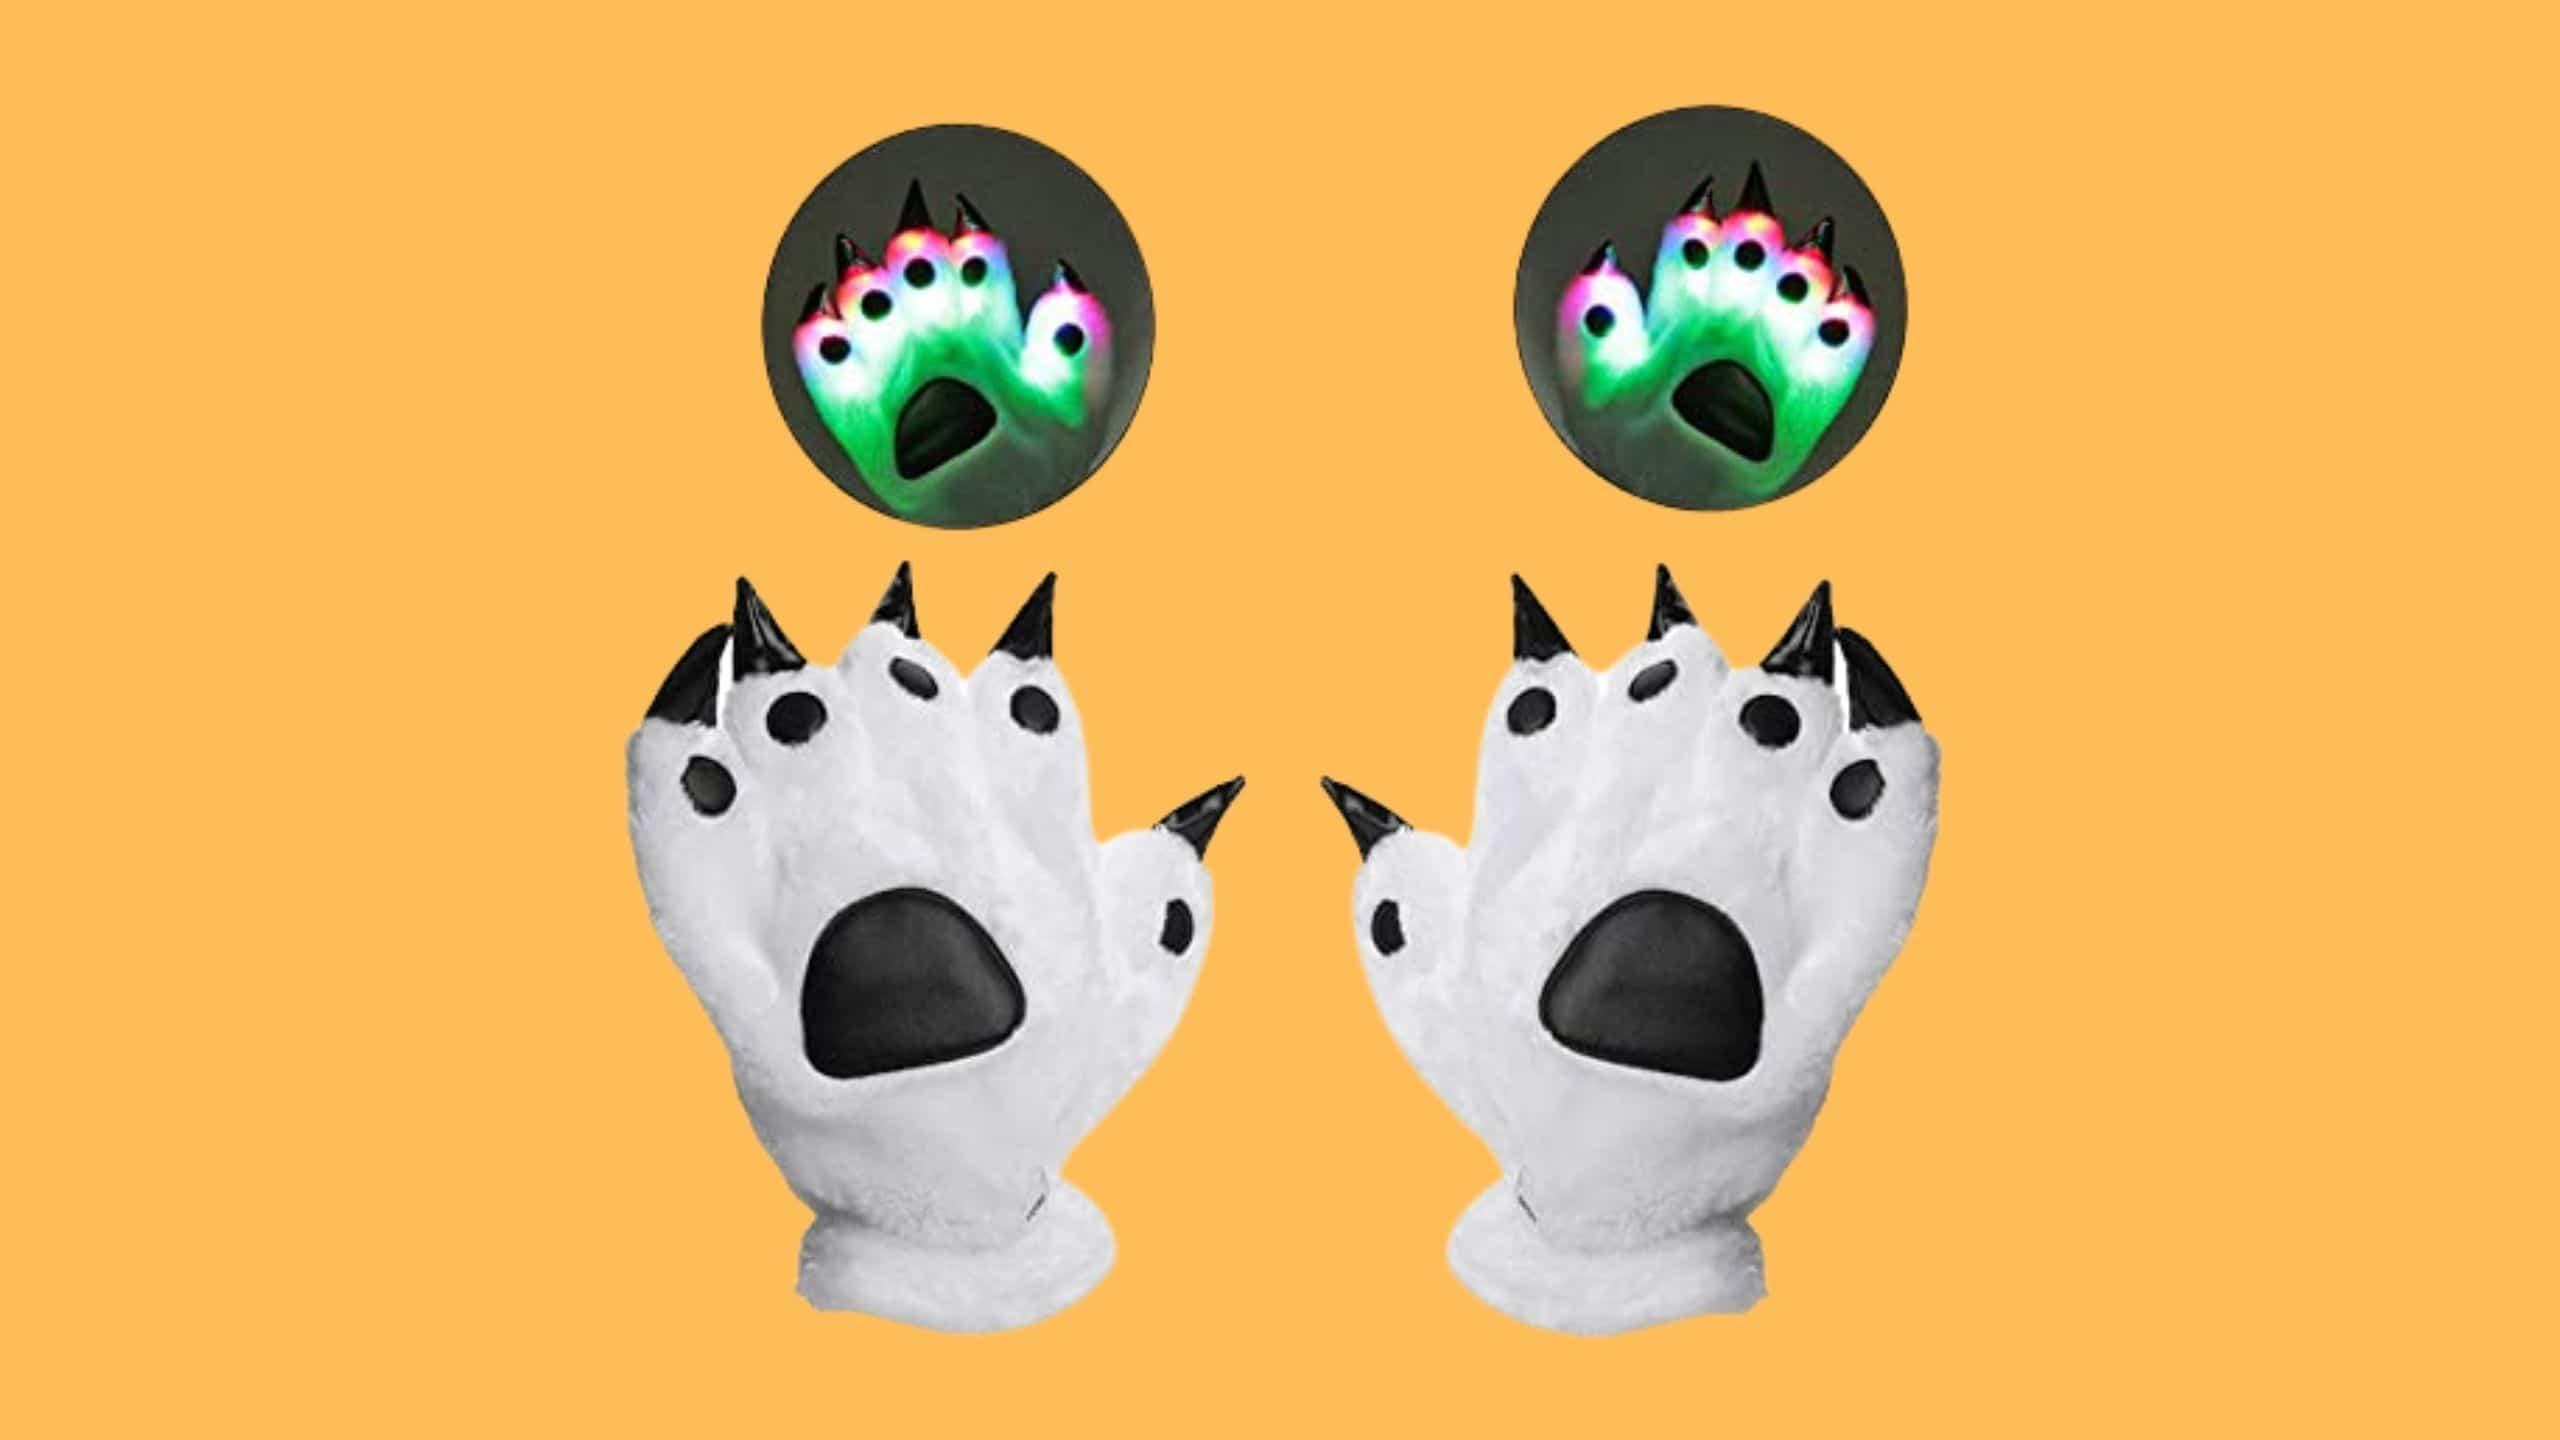 Luwint LED Bear Paw Gloves for Festivals and Raves